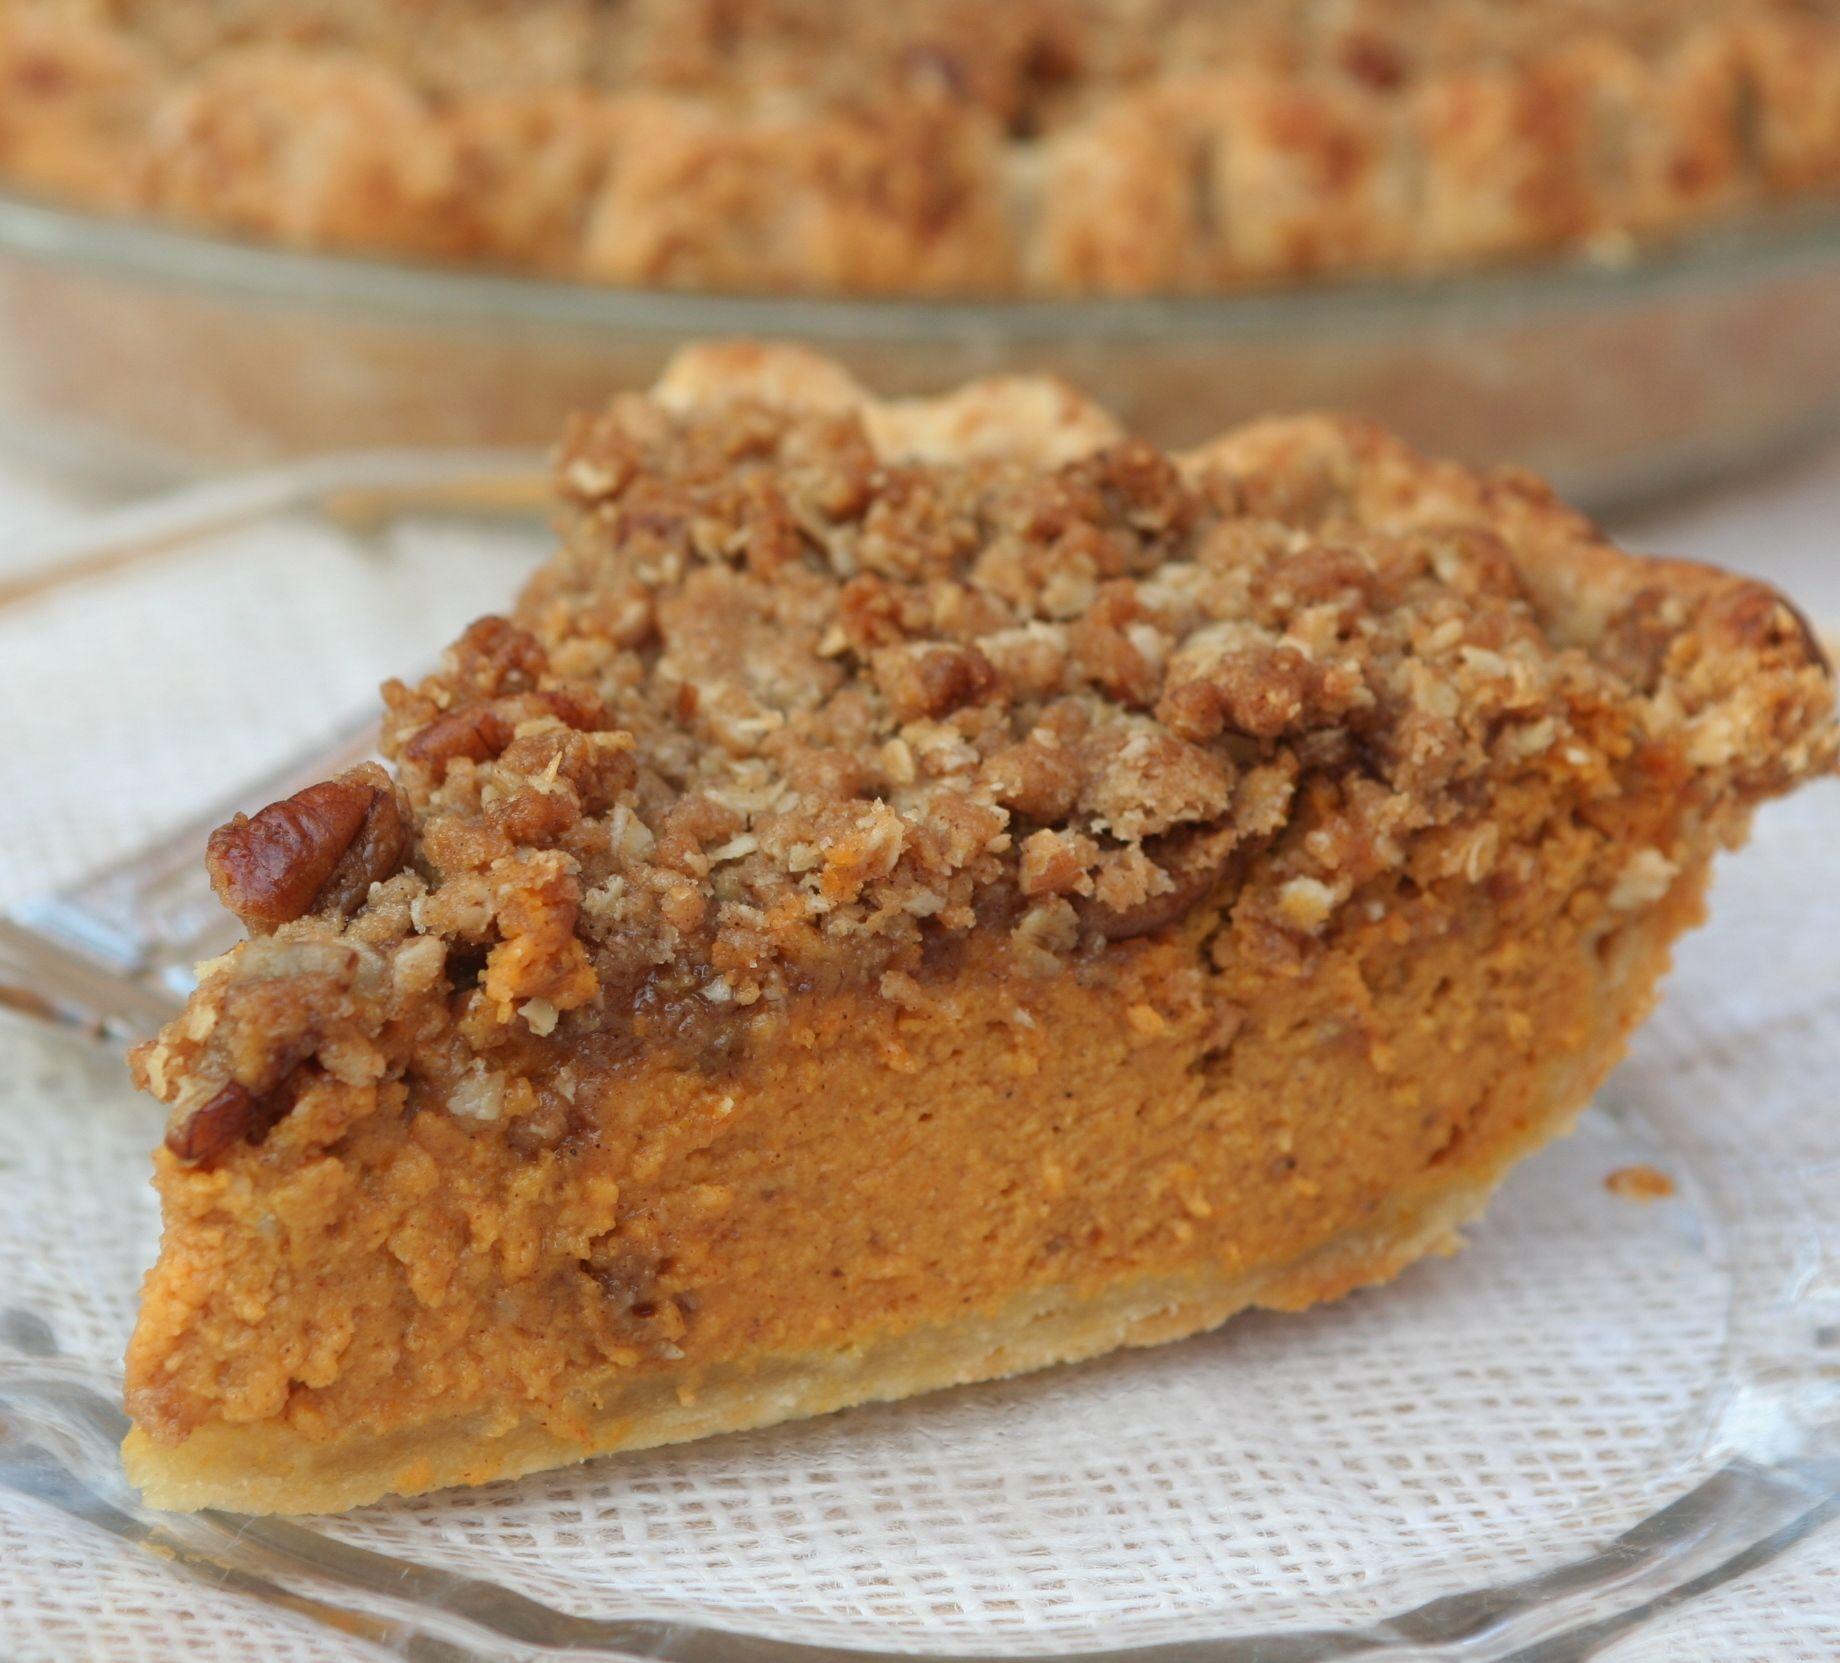 Thanksgiving Desserts Pecan Pie Pumpkin Pie More: Pecan-Streusel Topped Pumpkin Pie